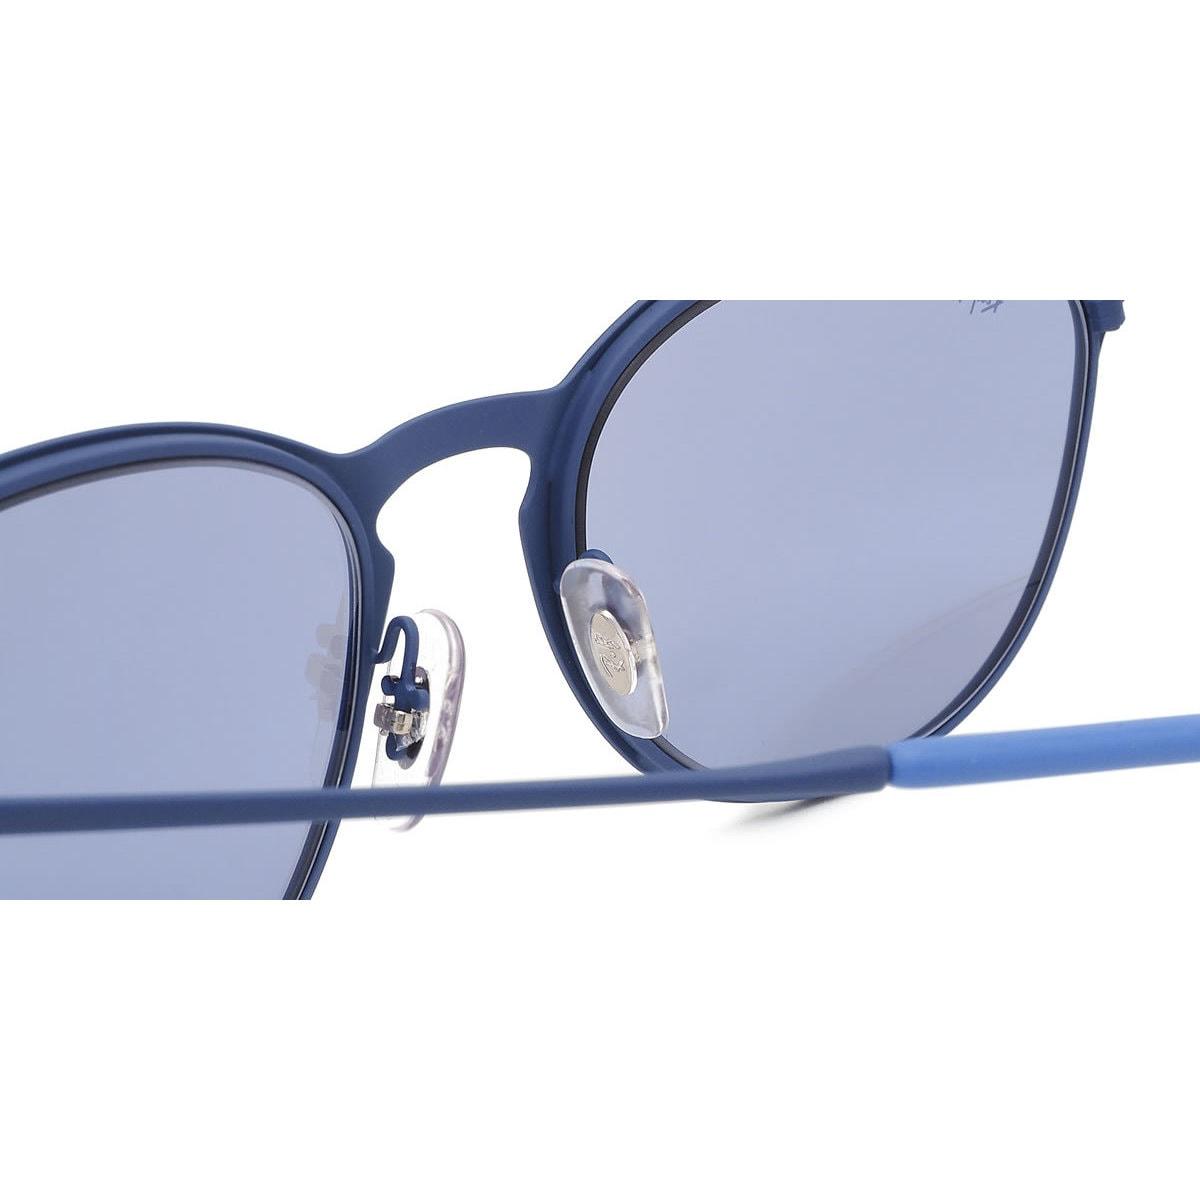 0ad6872e1279a Shop Ray-Ban Men s RB3539 90221U Erika Blue Frame Grey Mirror 54mm Lens  Sunglasses - Free Shipping Today - Overstock.com - 16740887